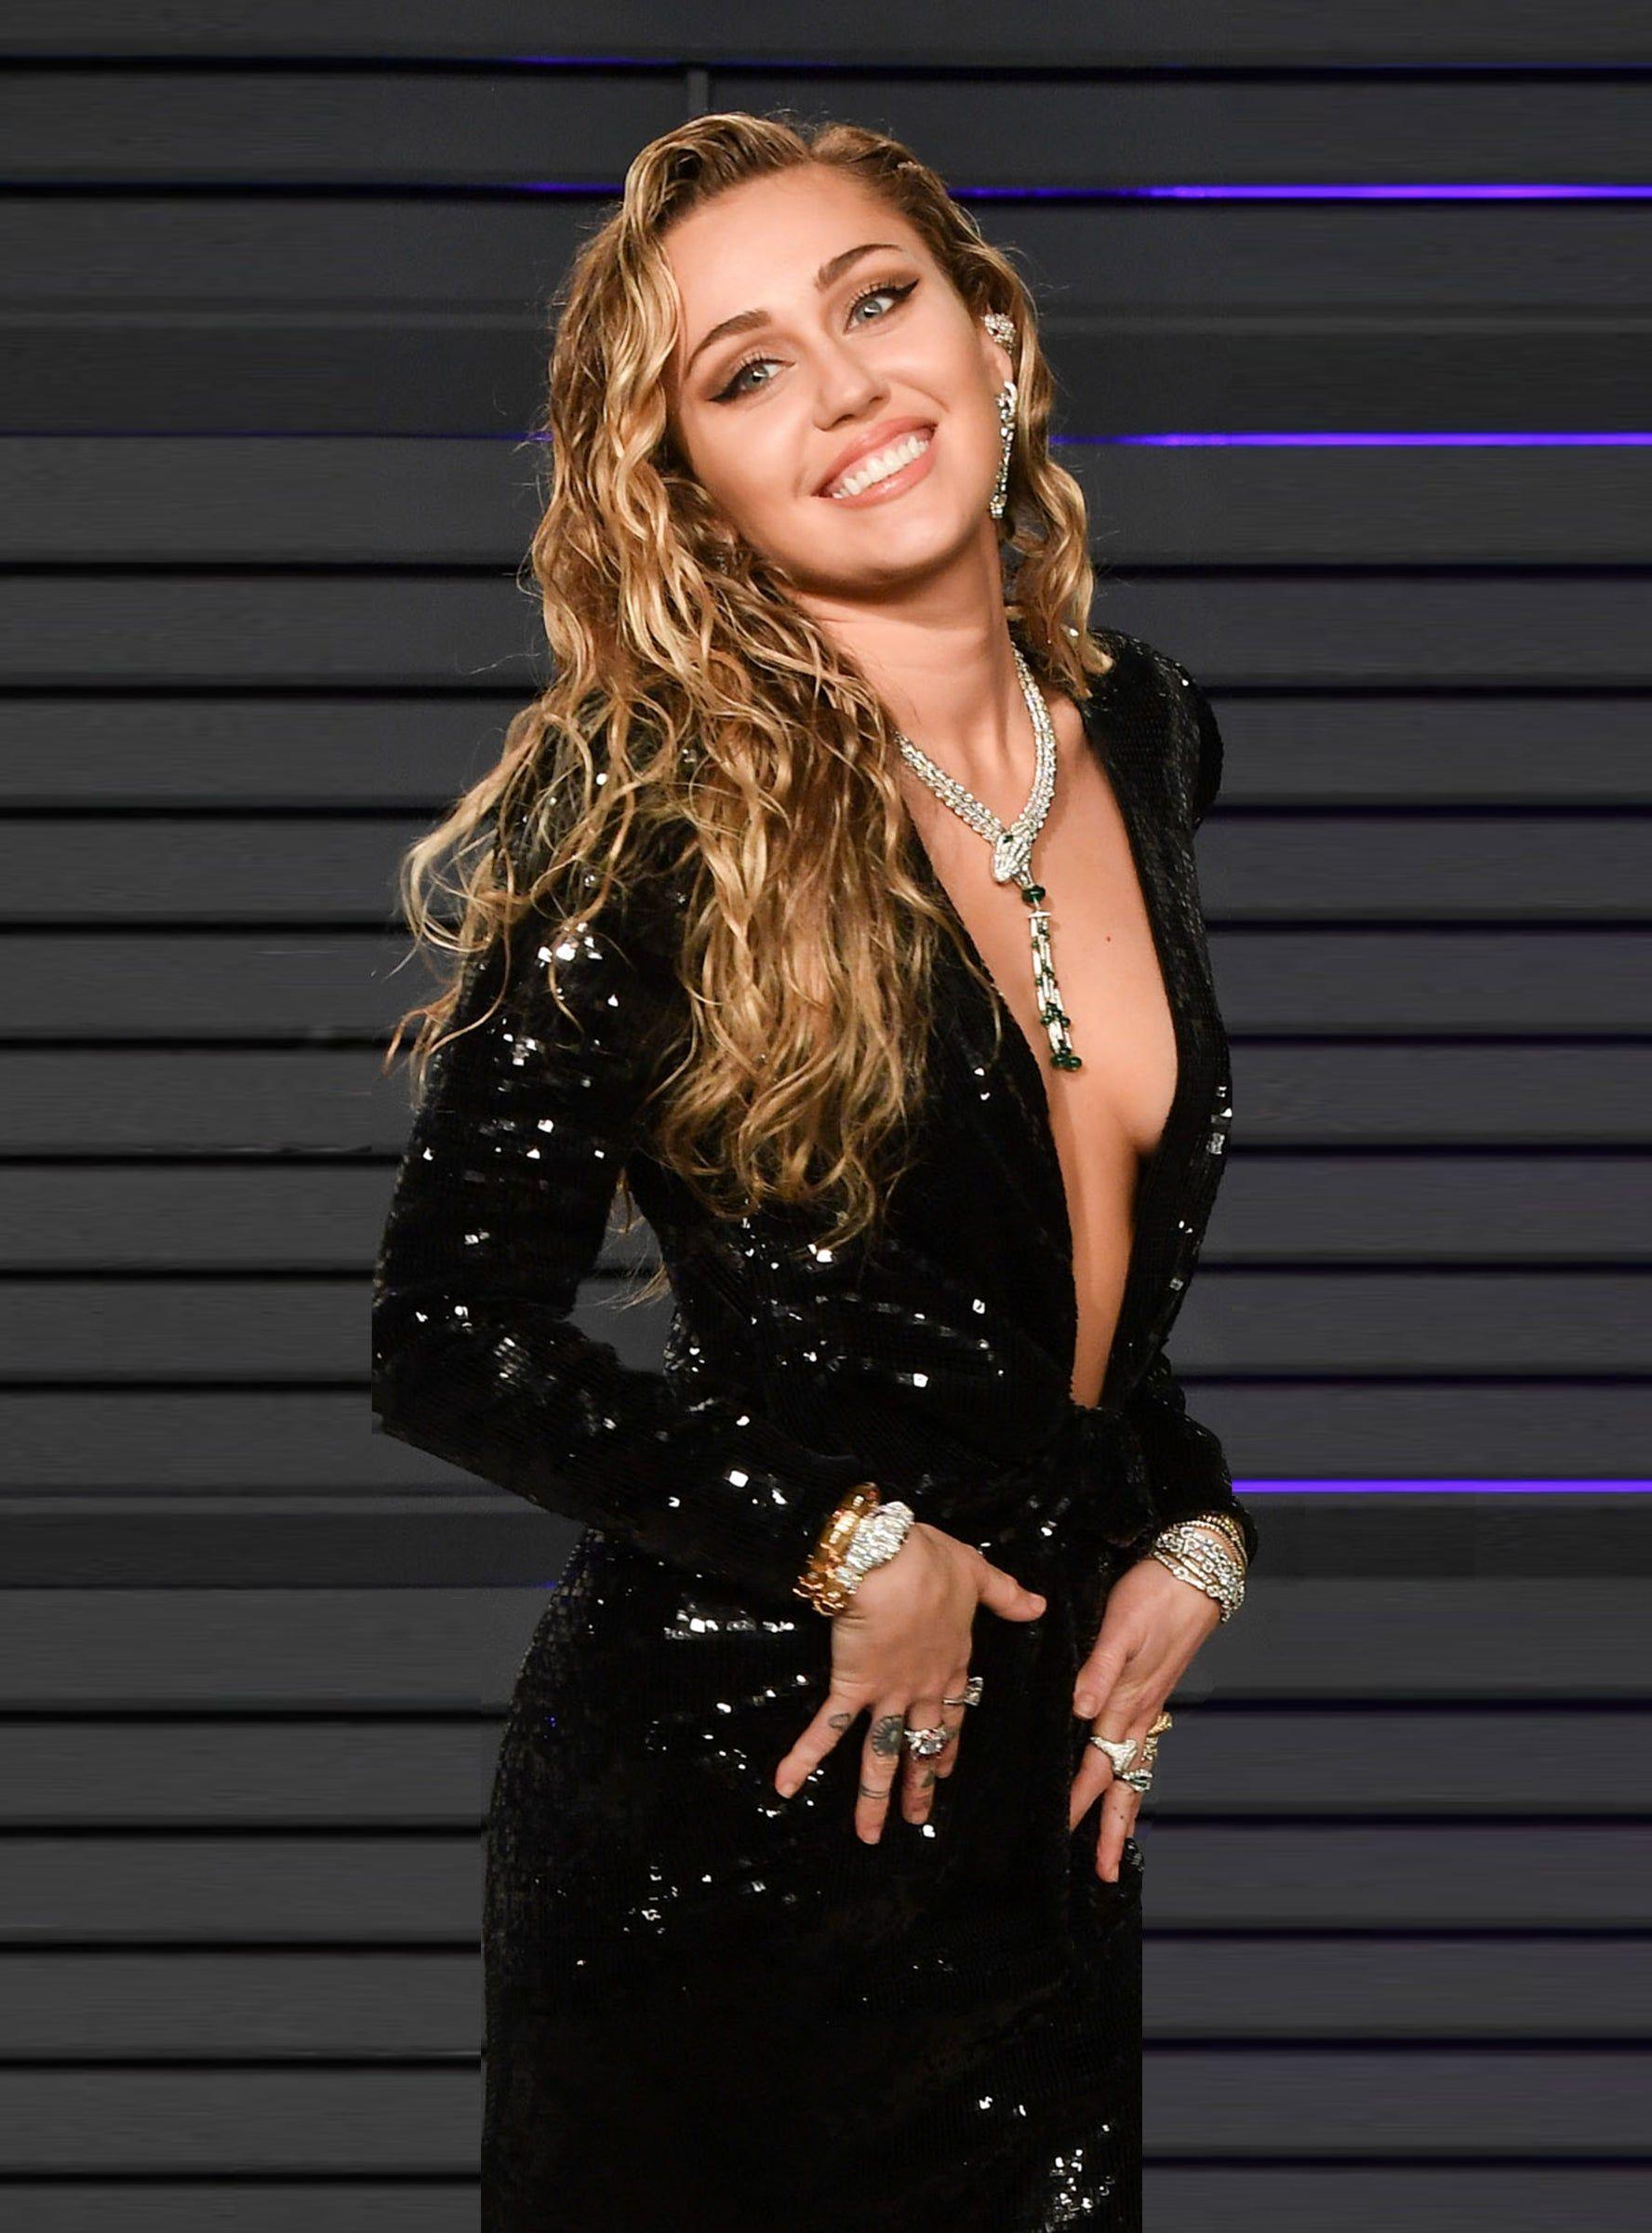 Miley cyrus backstage sex video